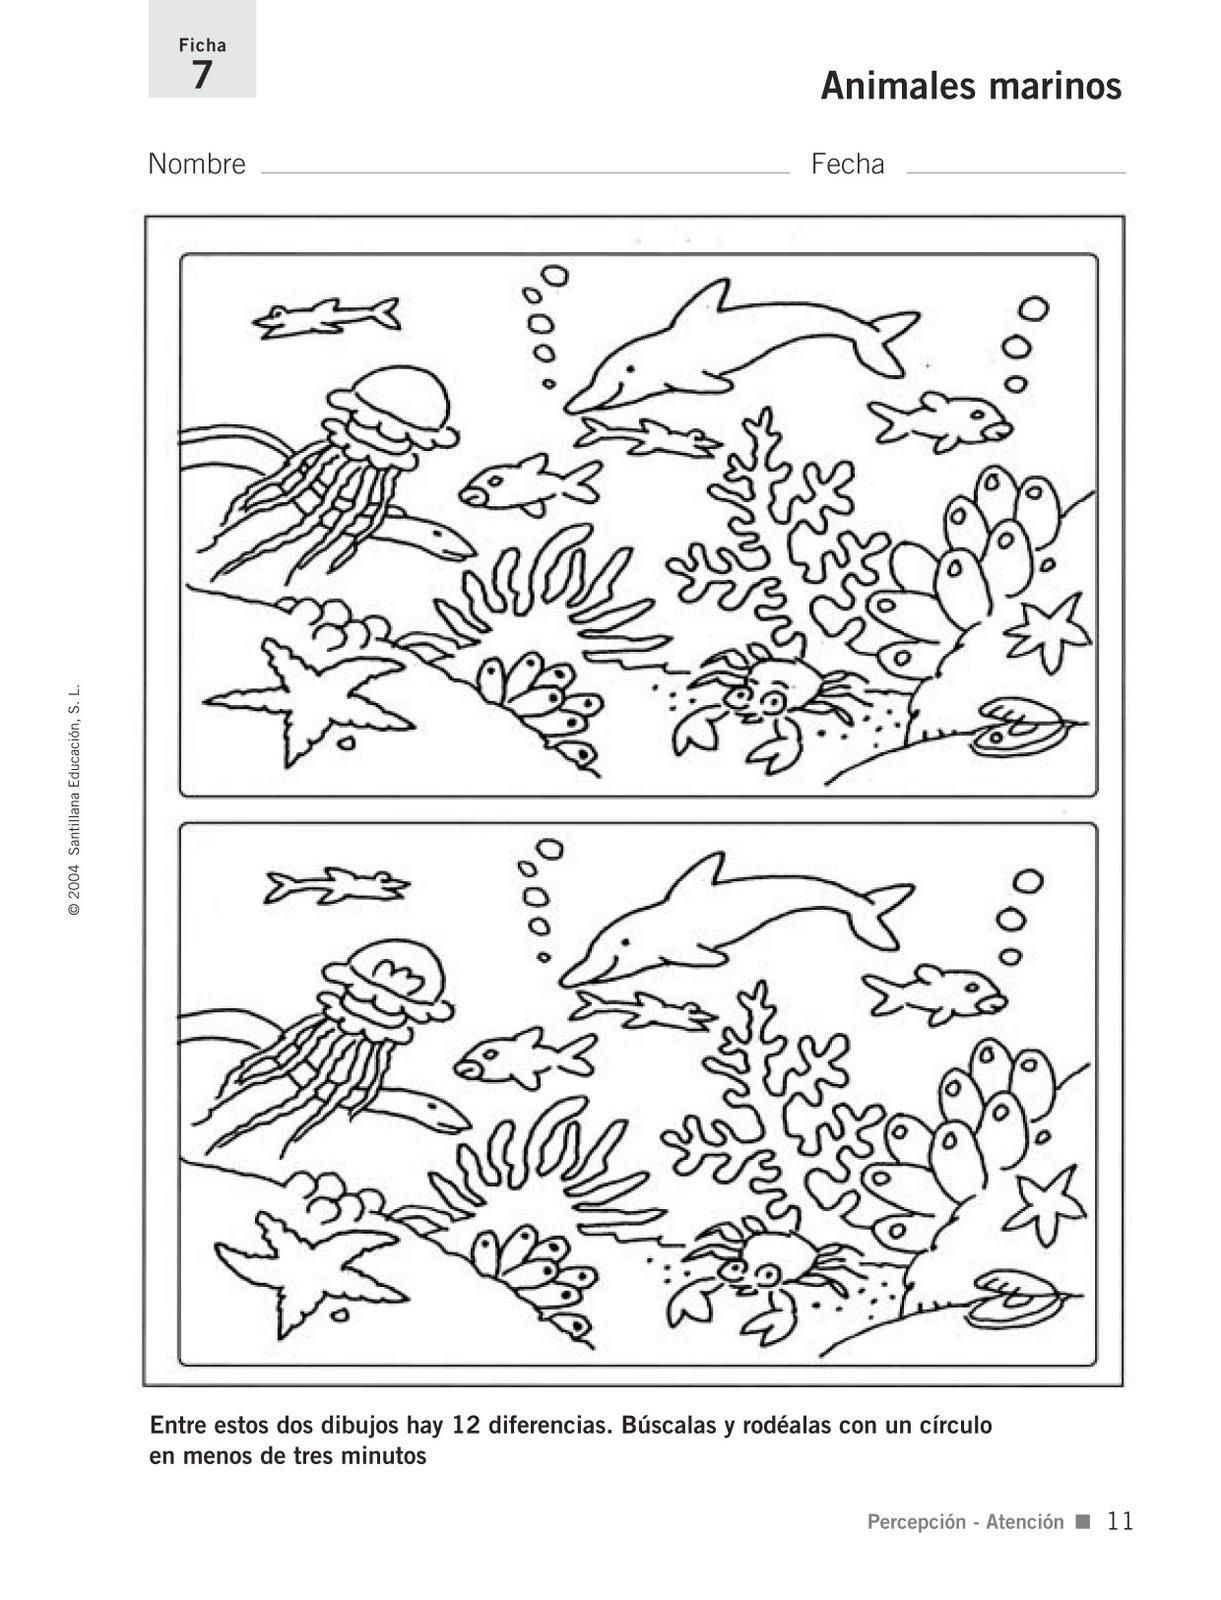 Imagenes De Carpetas De Educacion Inicial | apexwallpapers.com